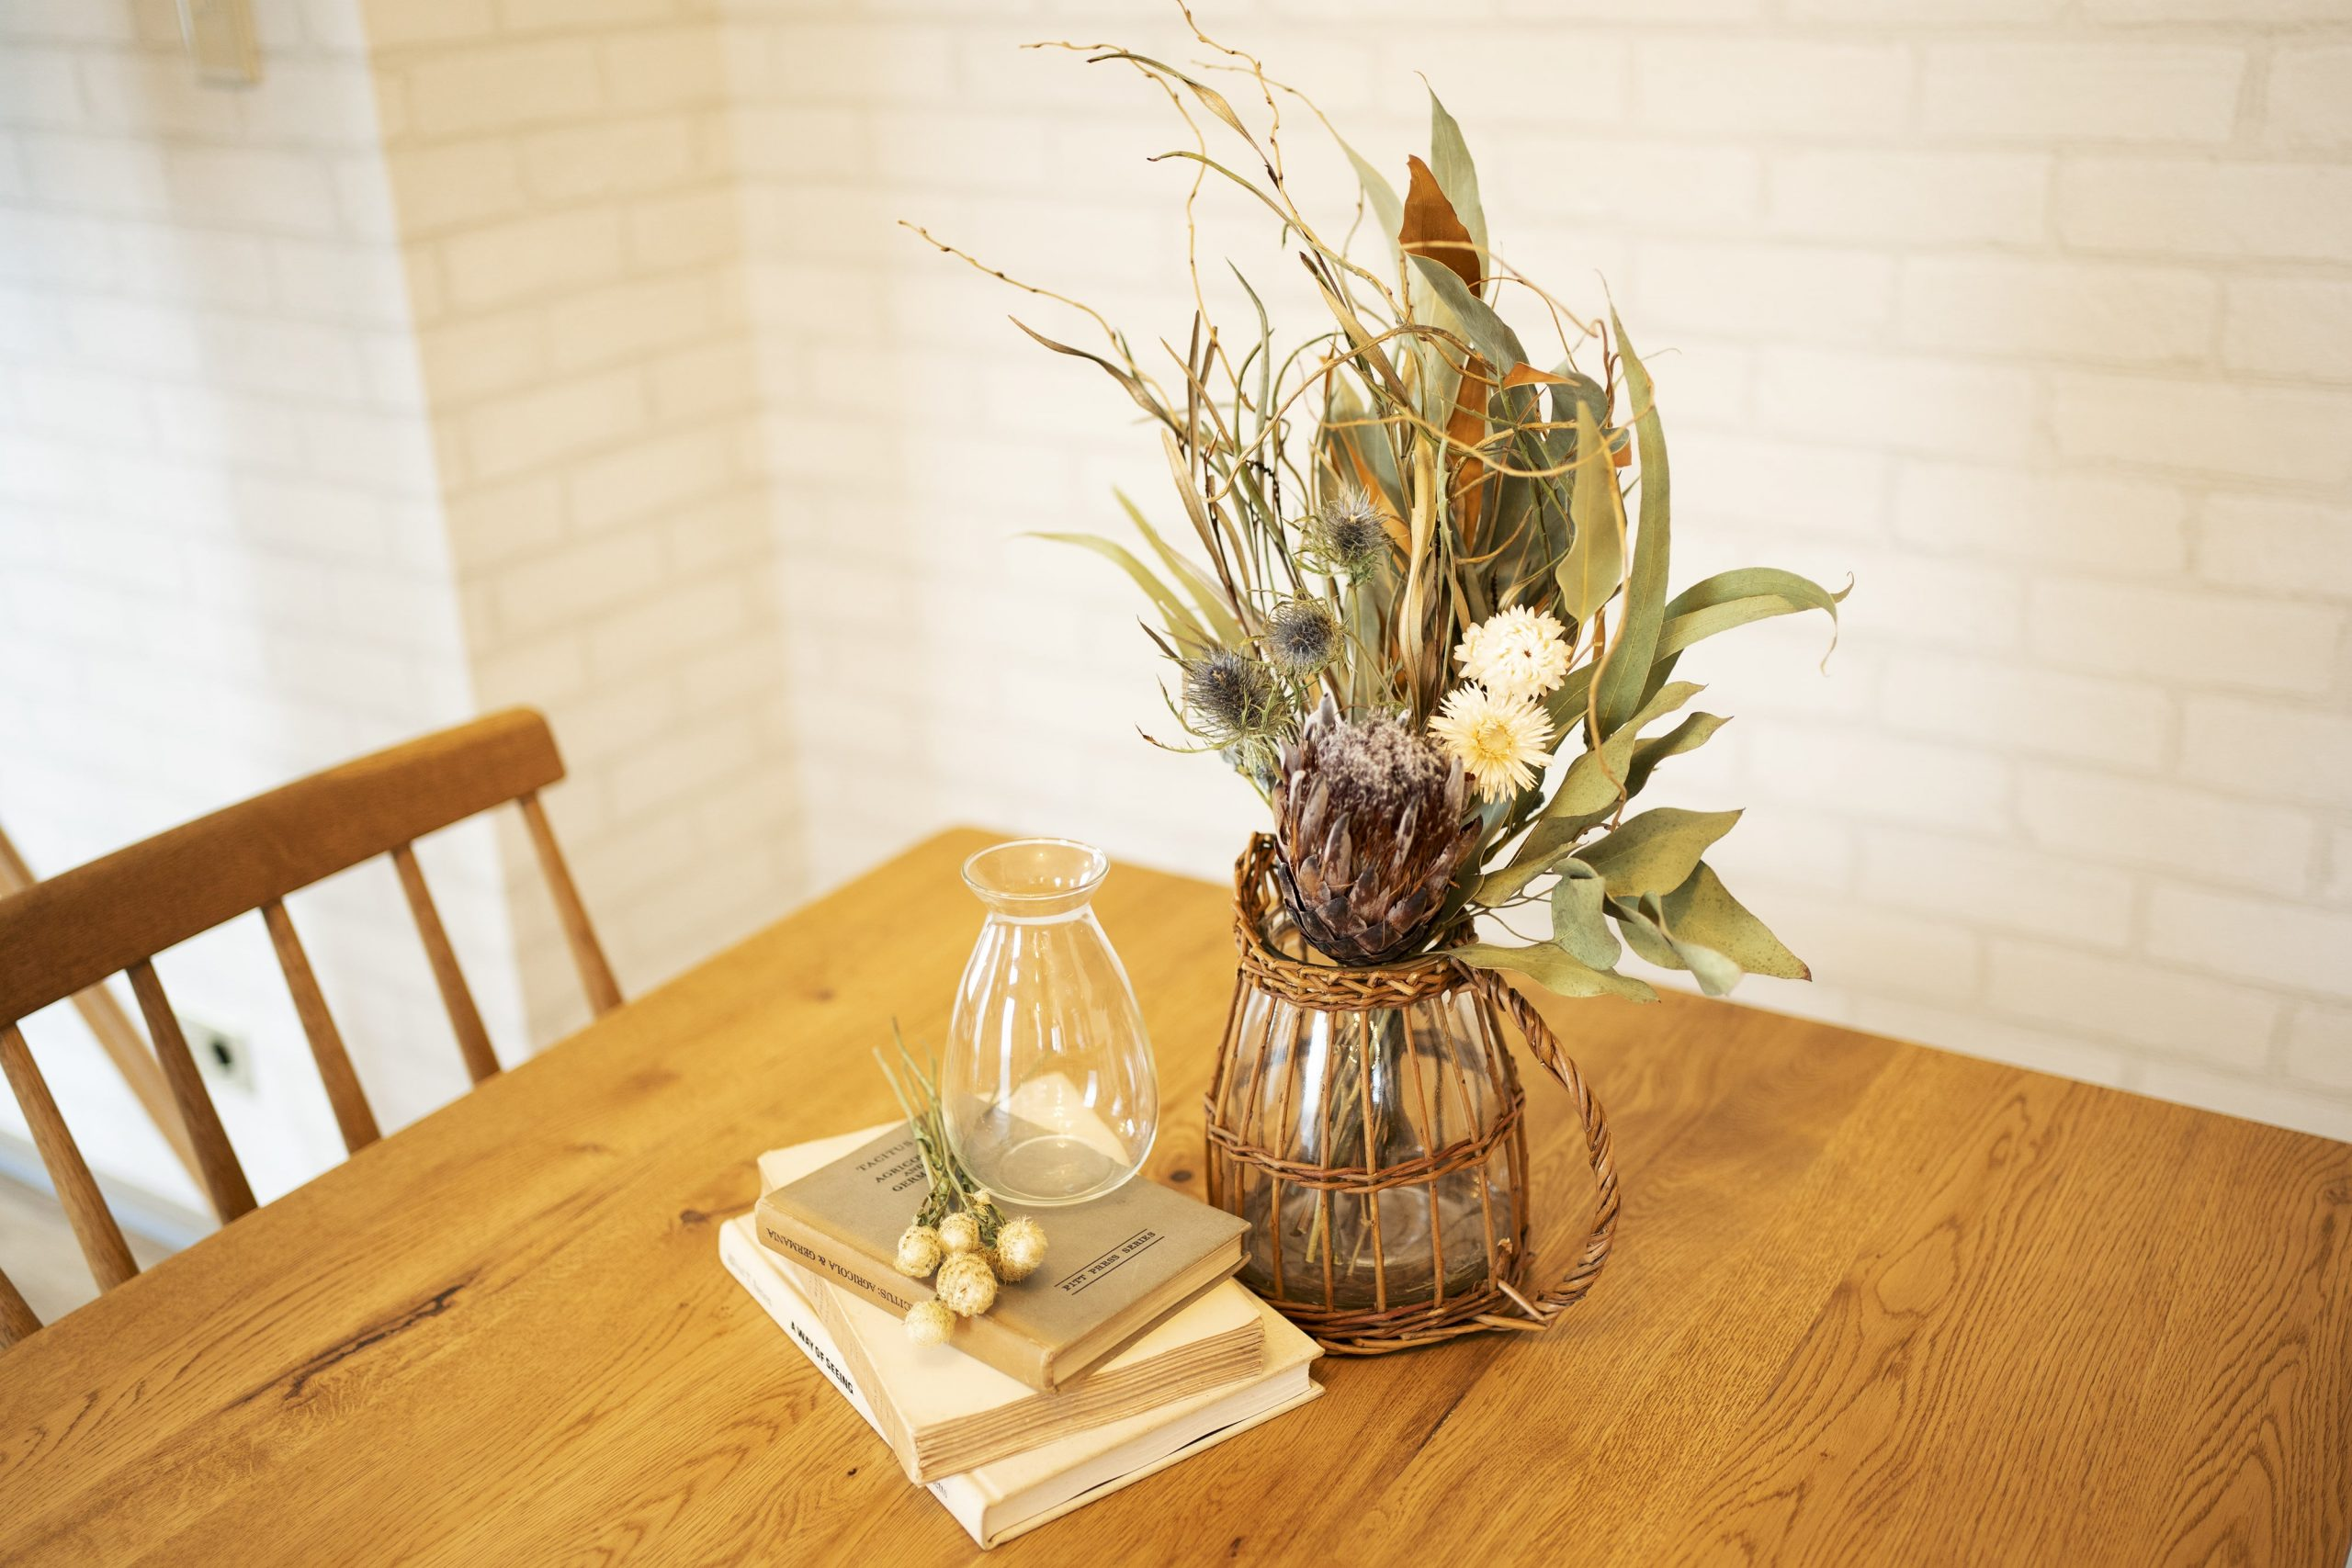 ◆SHIBUYA PARK RESIDENCEのお部屋